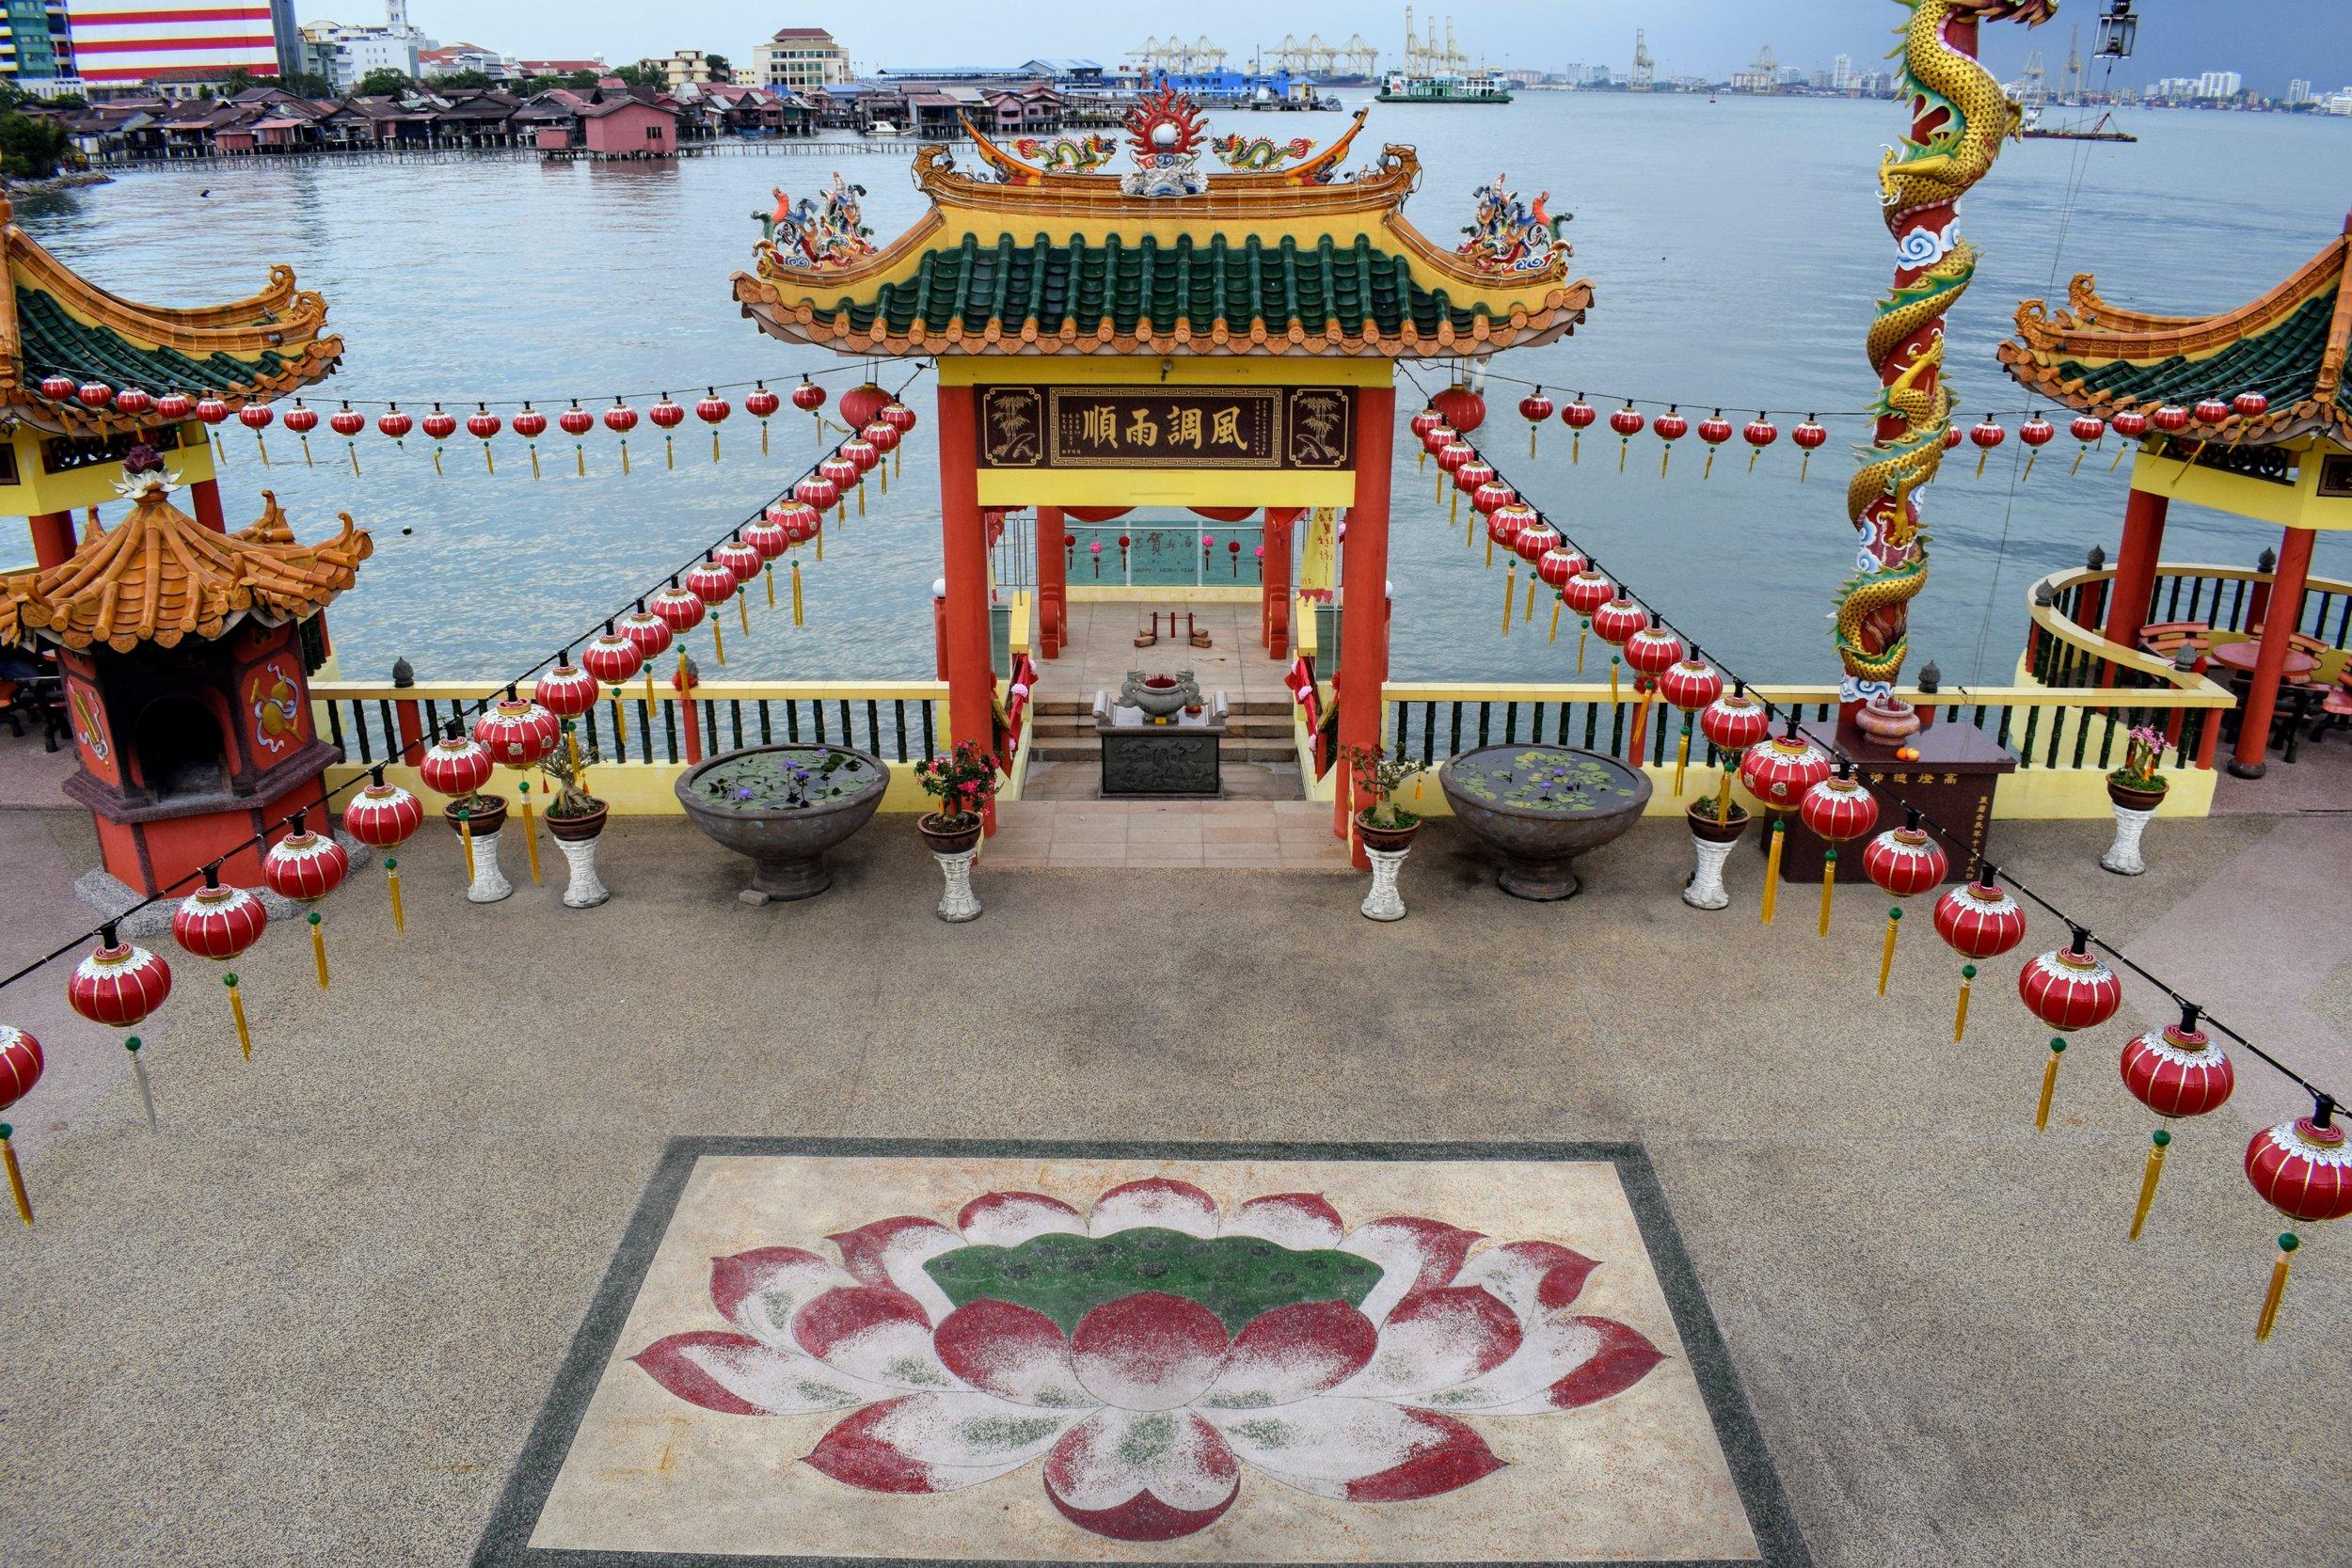 Hean Boo Thean Kuan Yin Temple, located off of Weld Quay.